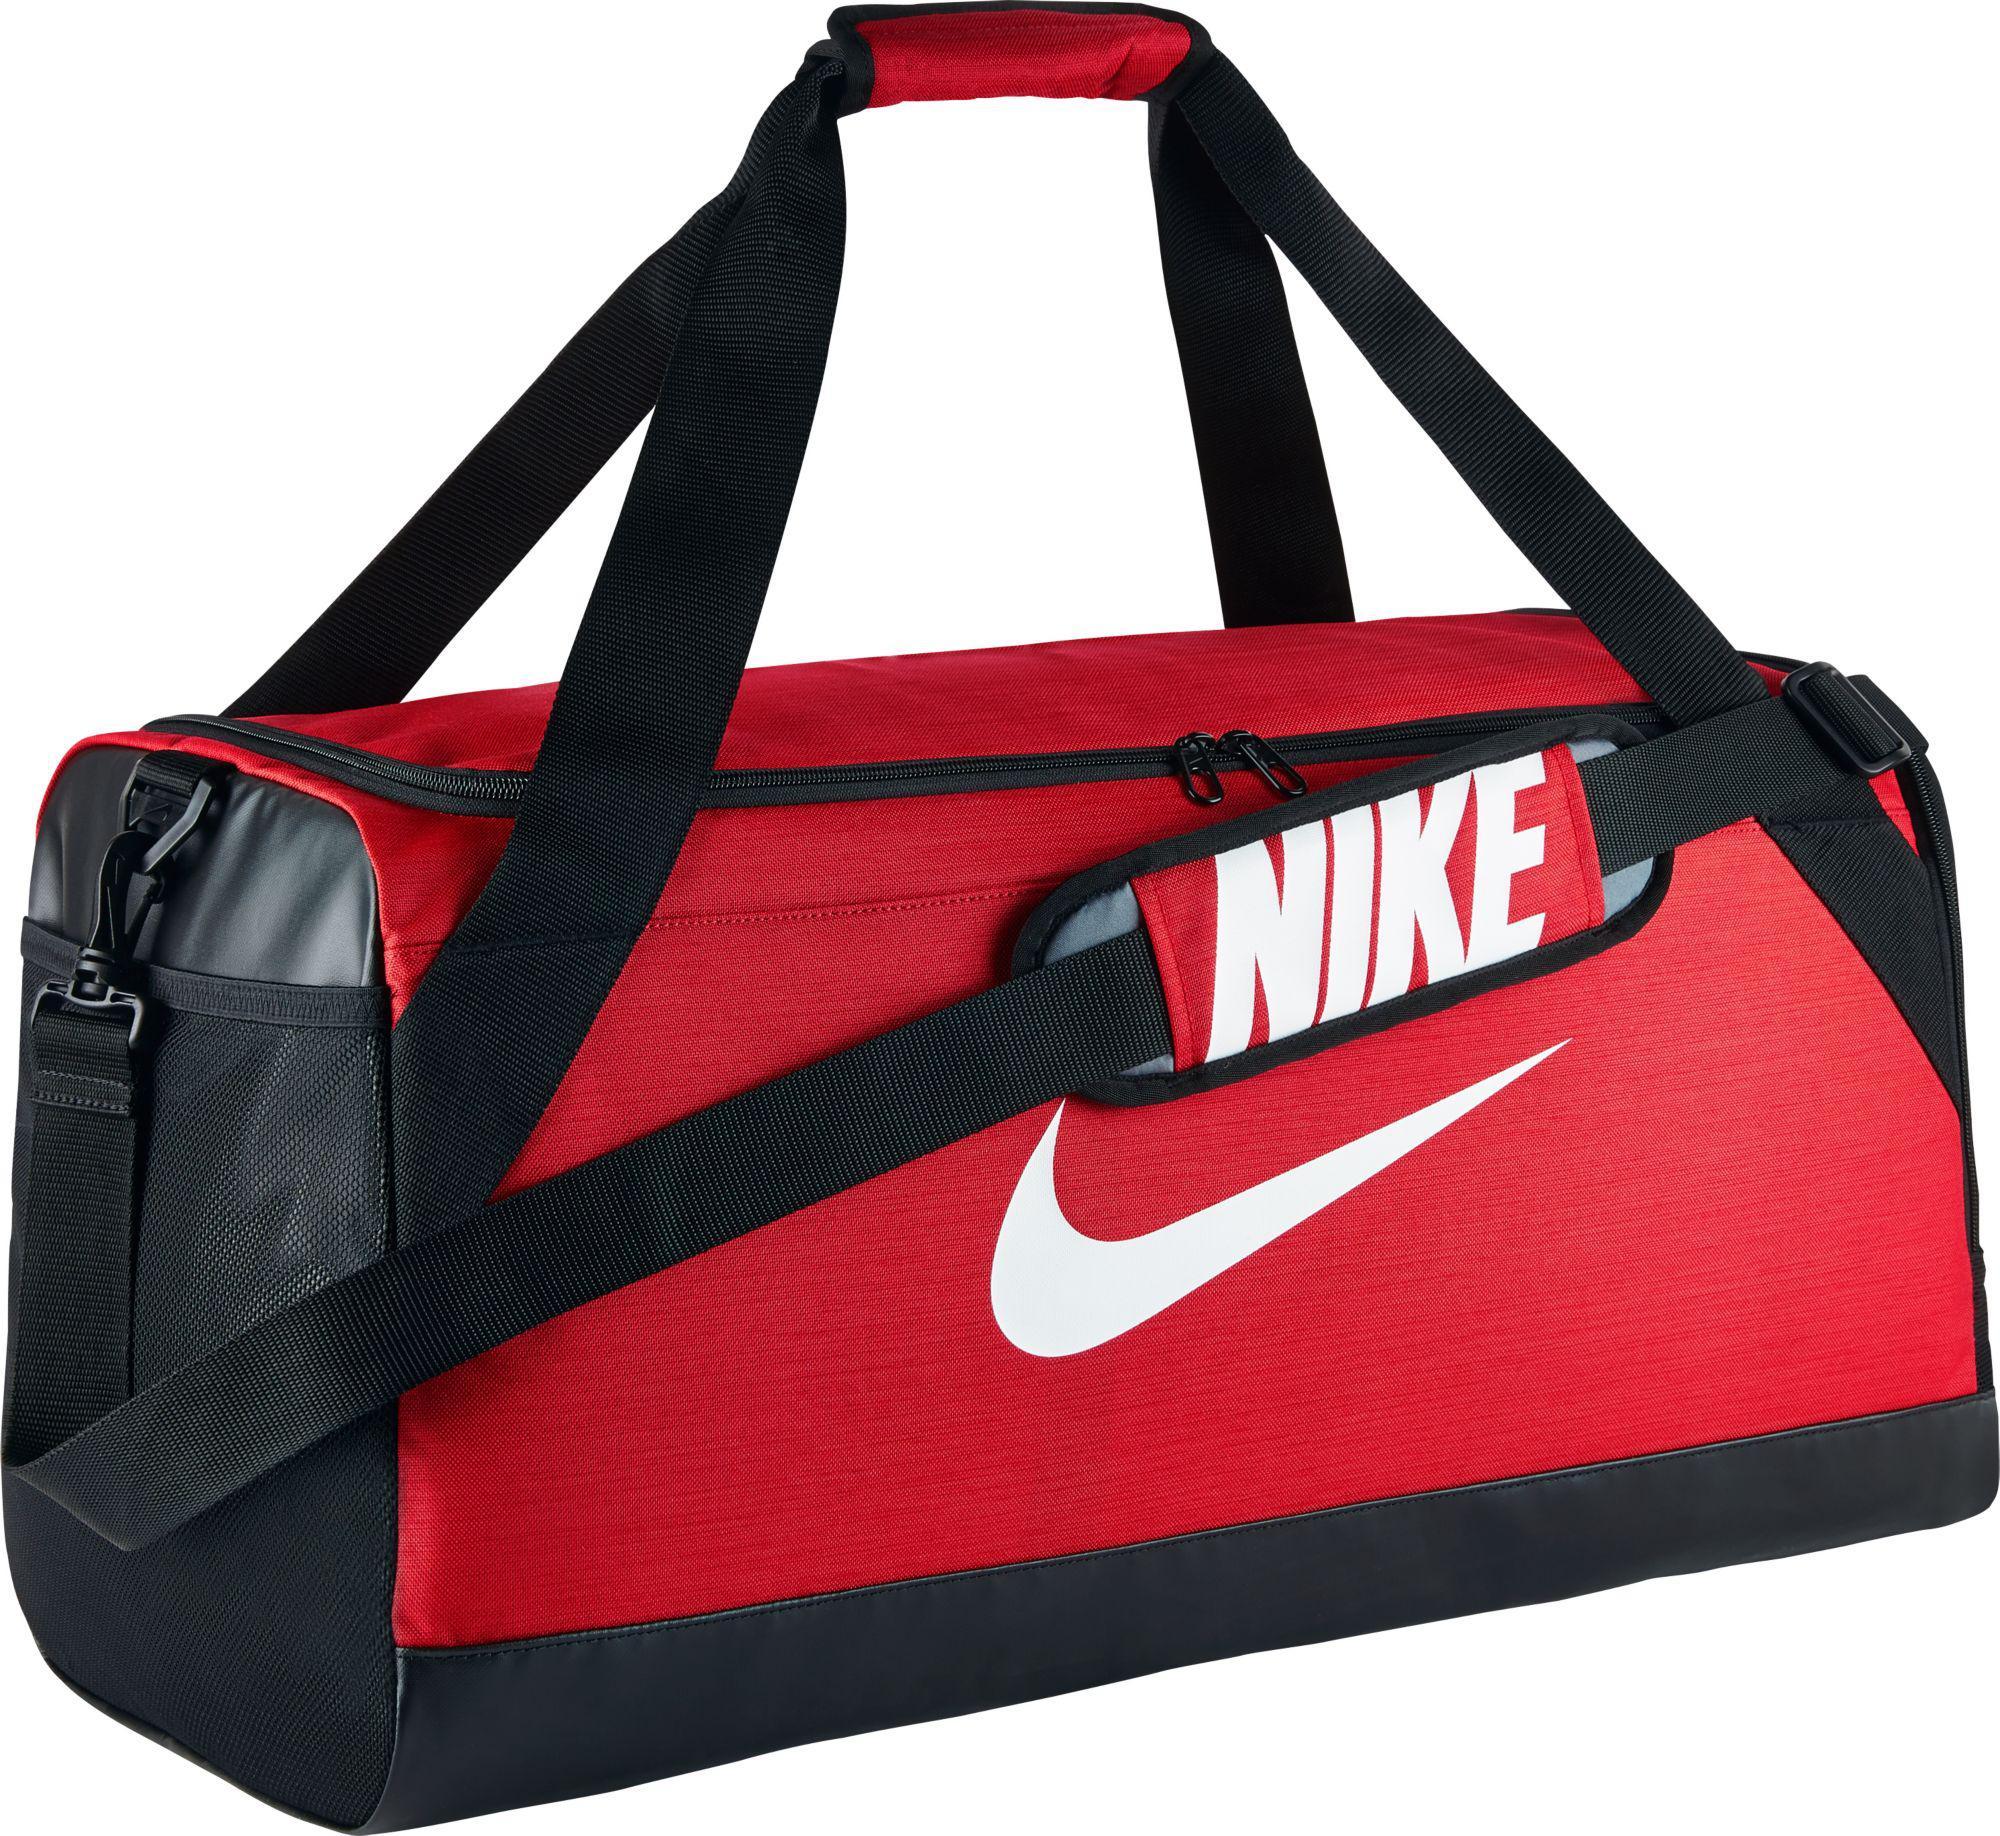 8b14cf2c0e66 Lyst - Nike Rasilia Medium Training Duffle Bag in Red for Men